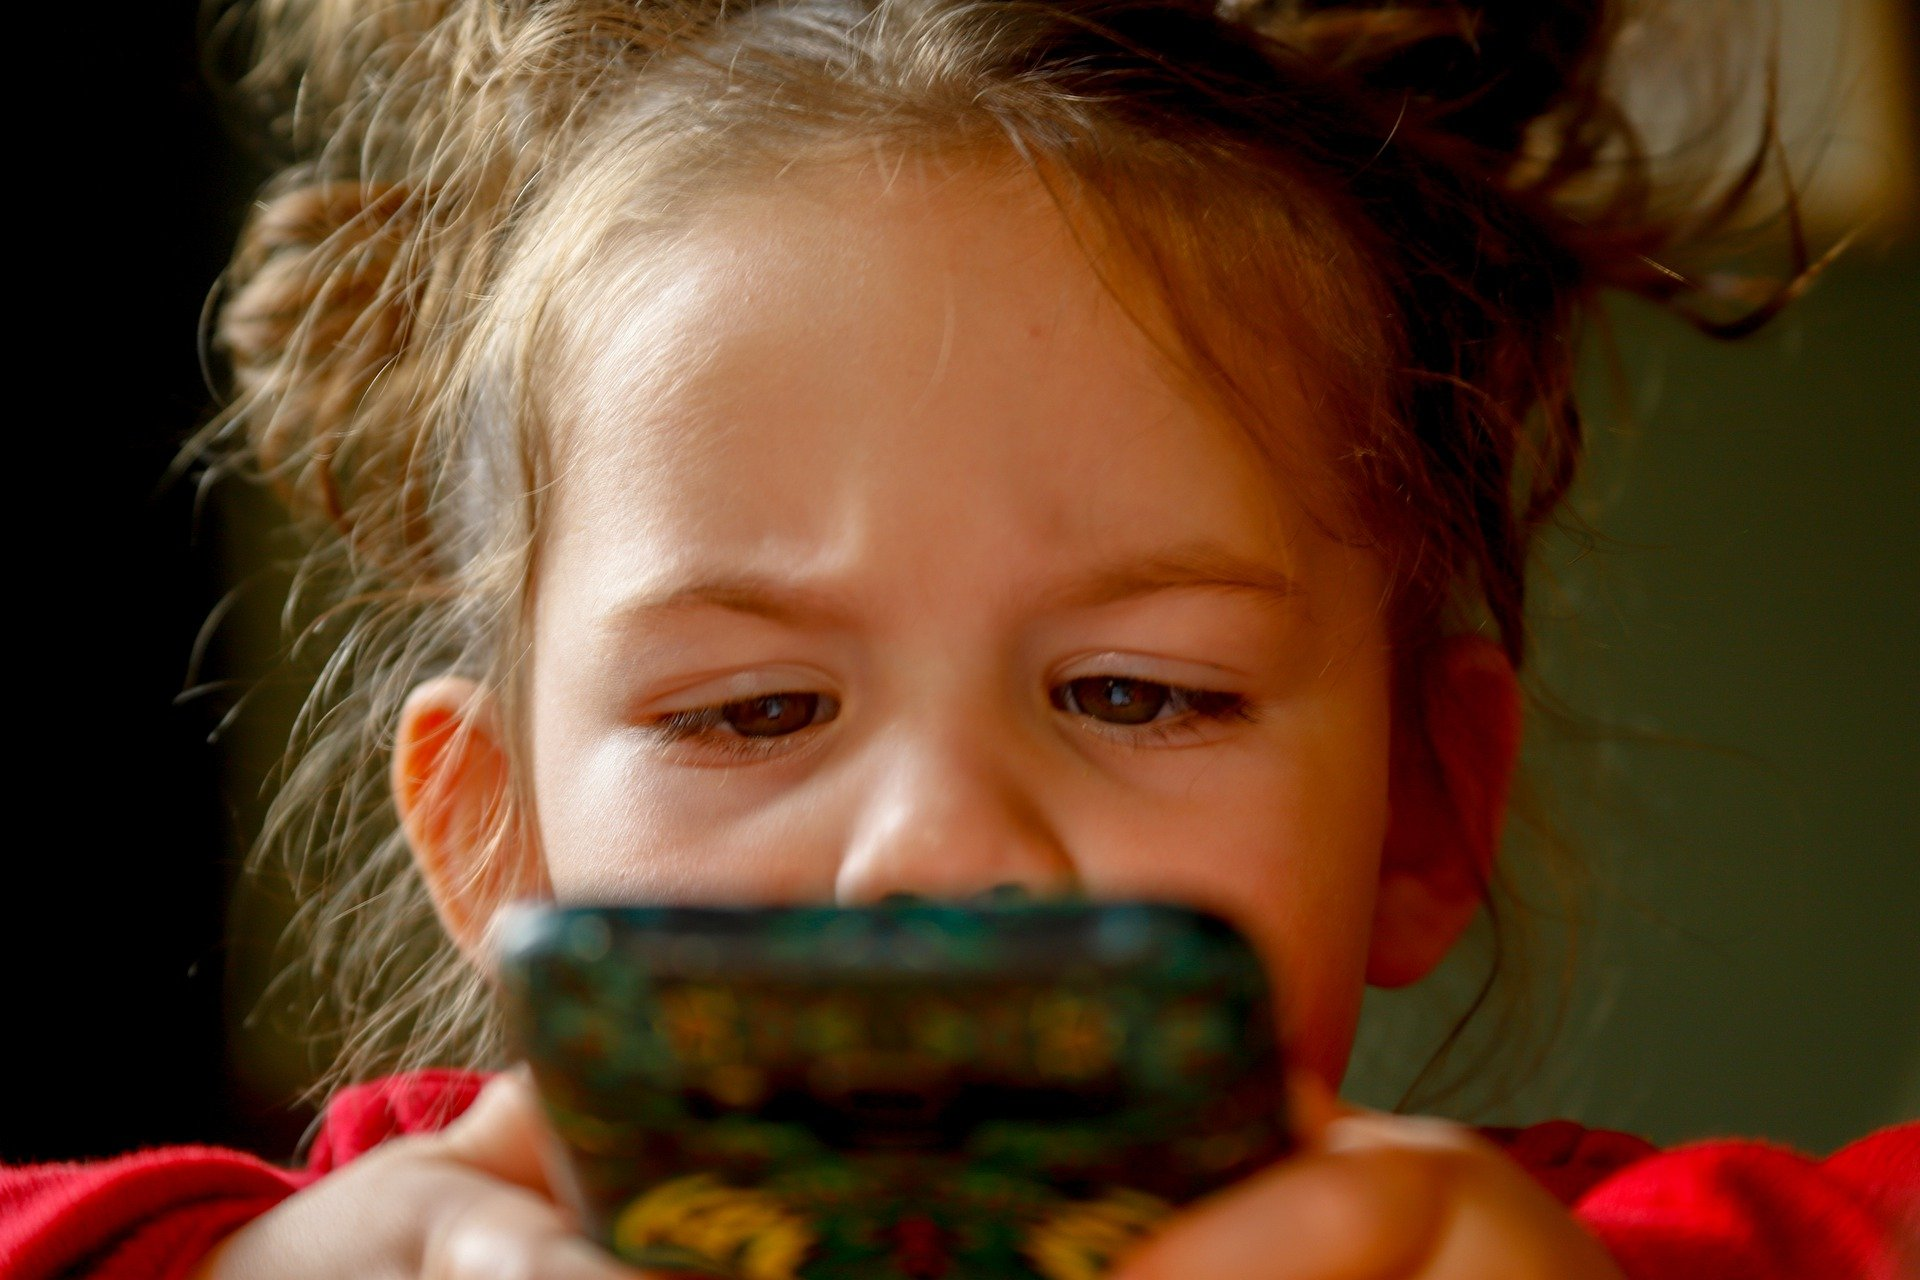 Tablet e smartphone, i rischi per i bambini